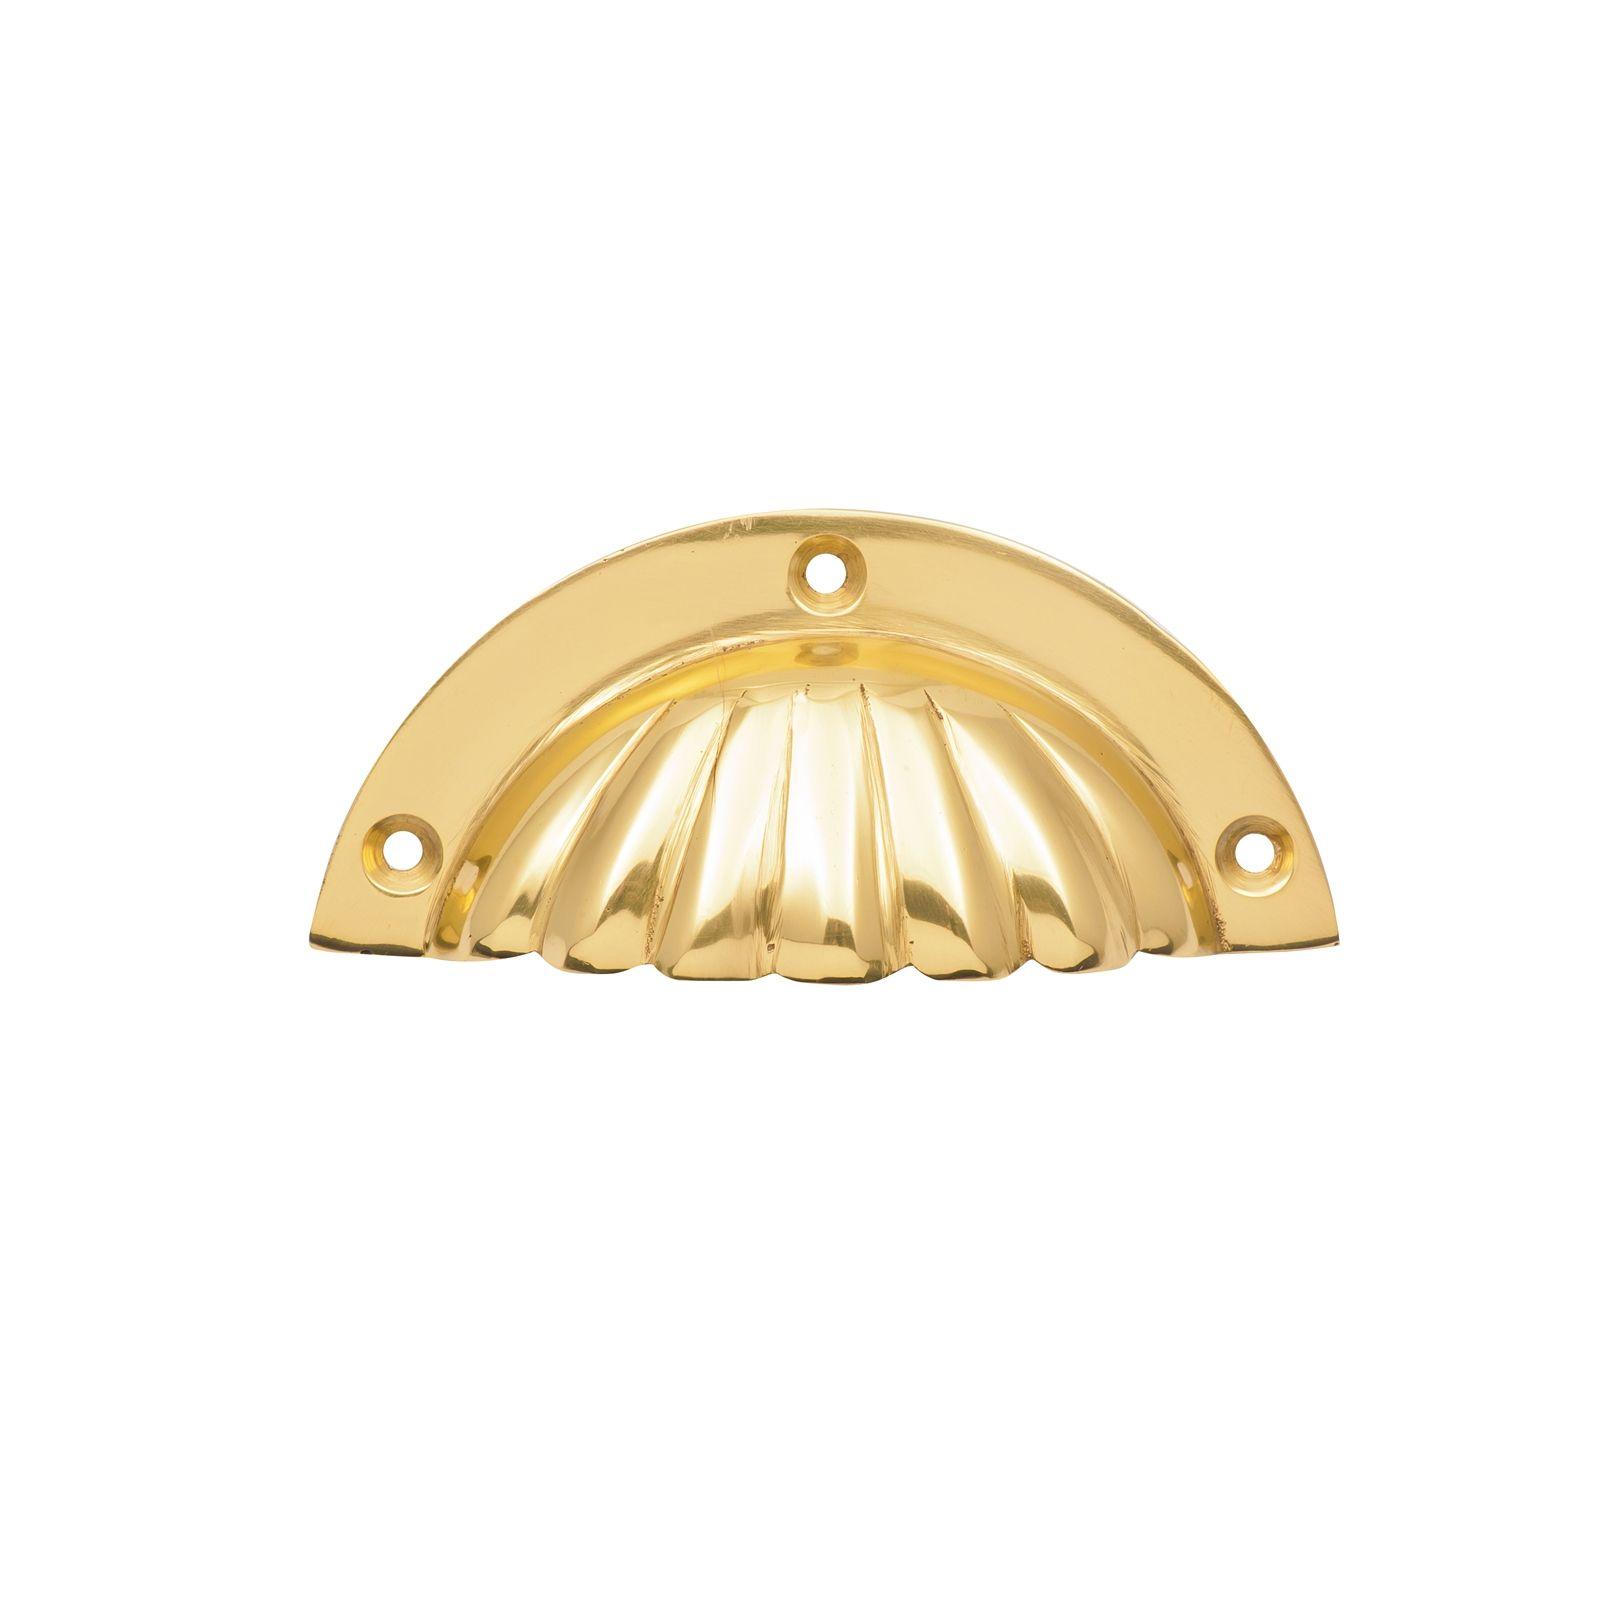 Black Kitchen Handles Bunnings: Bunnings Brass Cabinet Handles